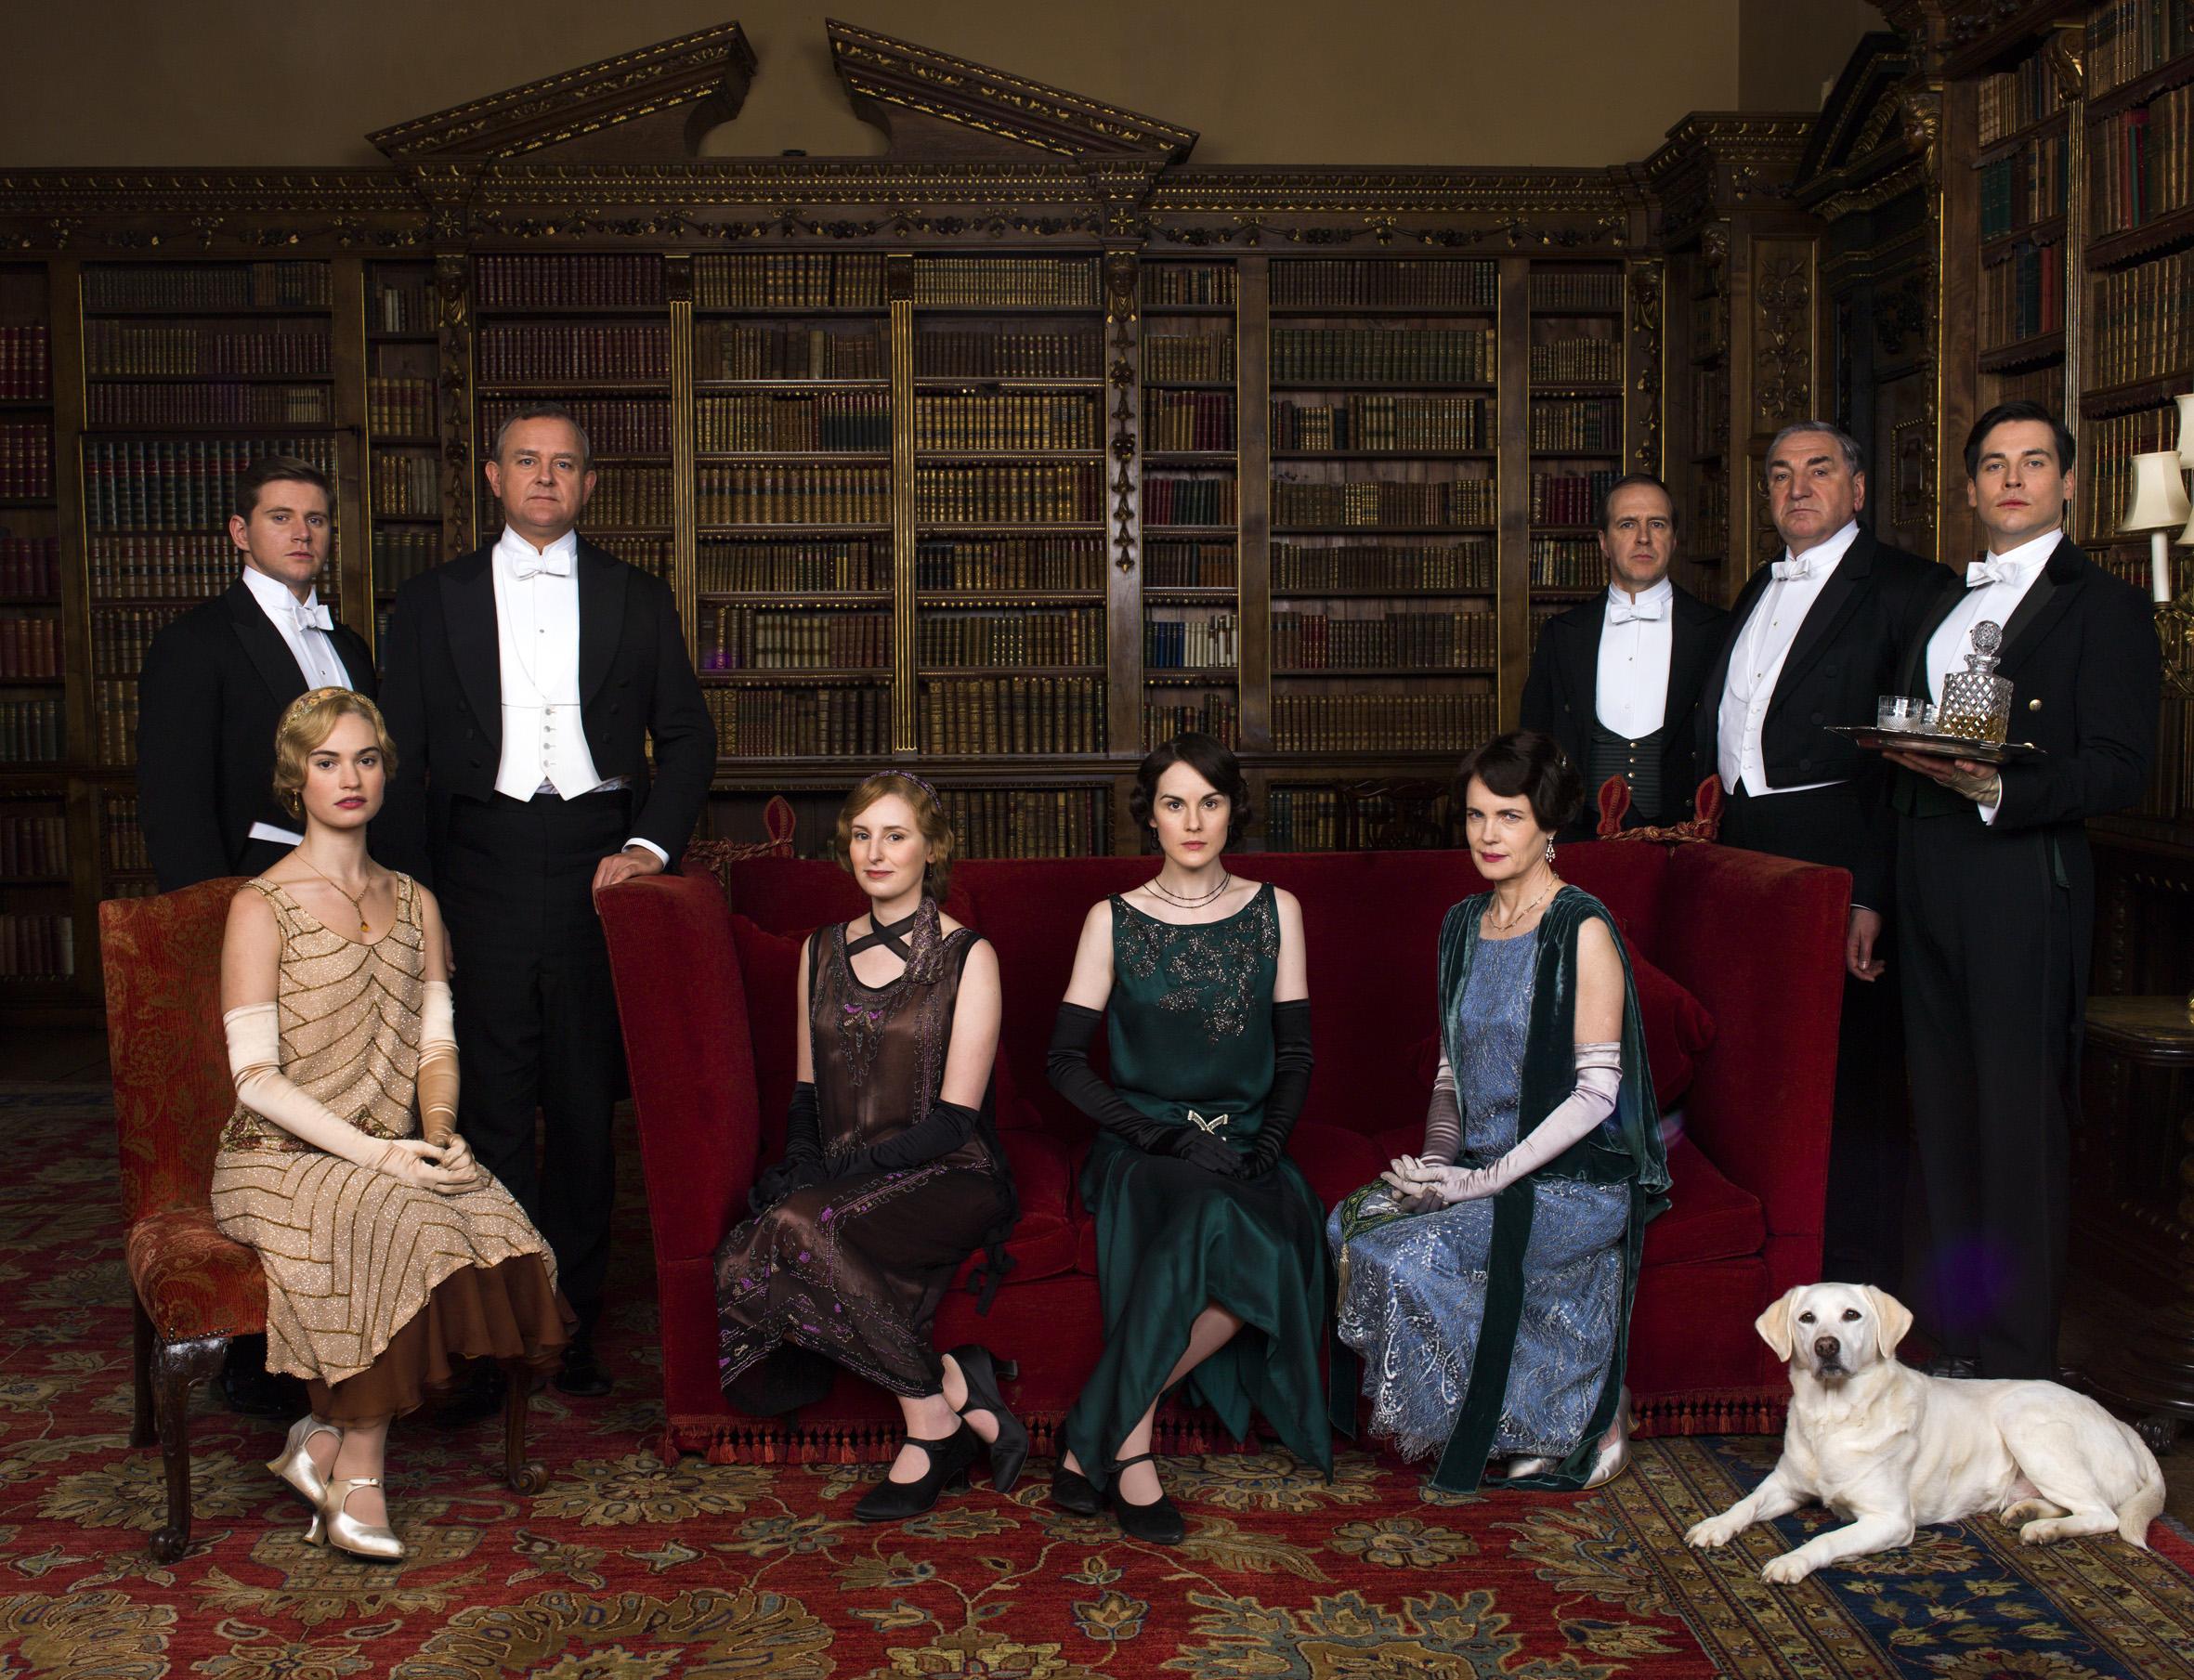 Downton Abbey Staffel 2 Folge 9